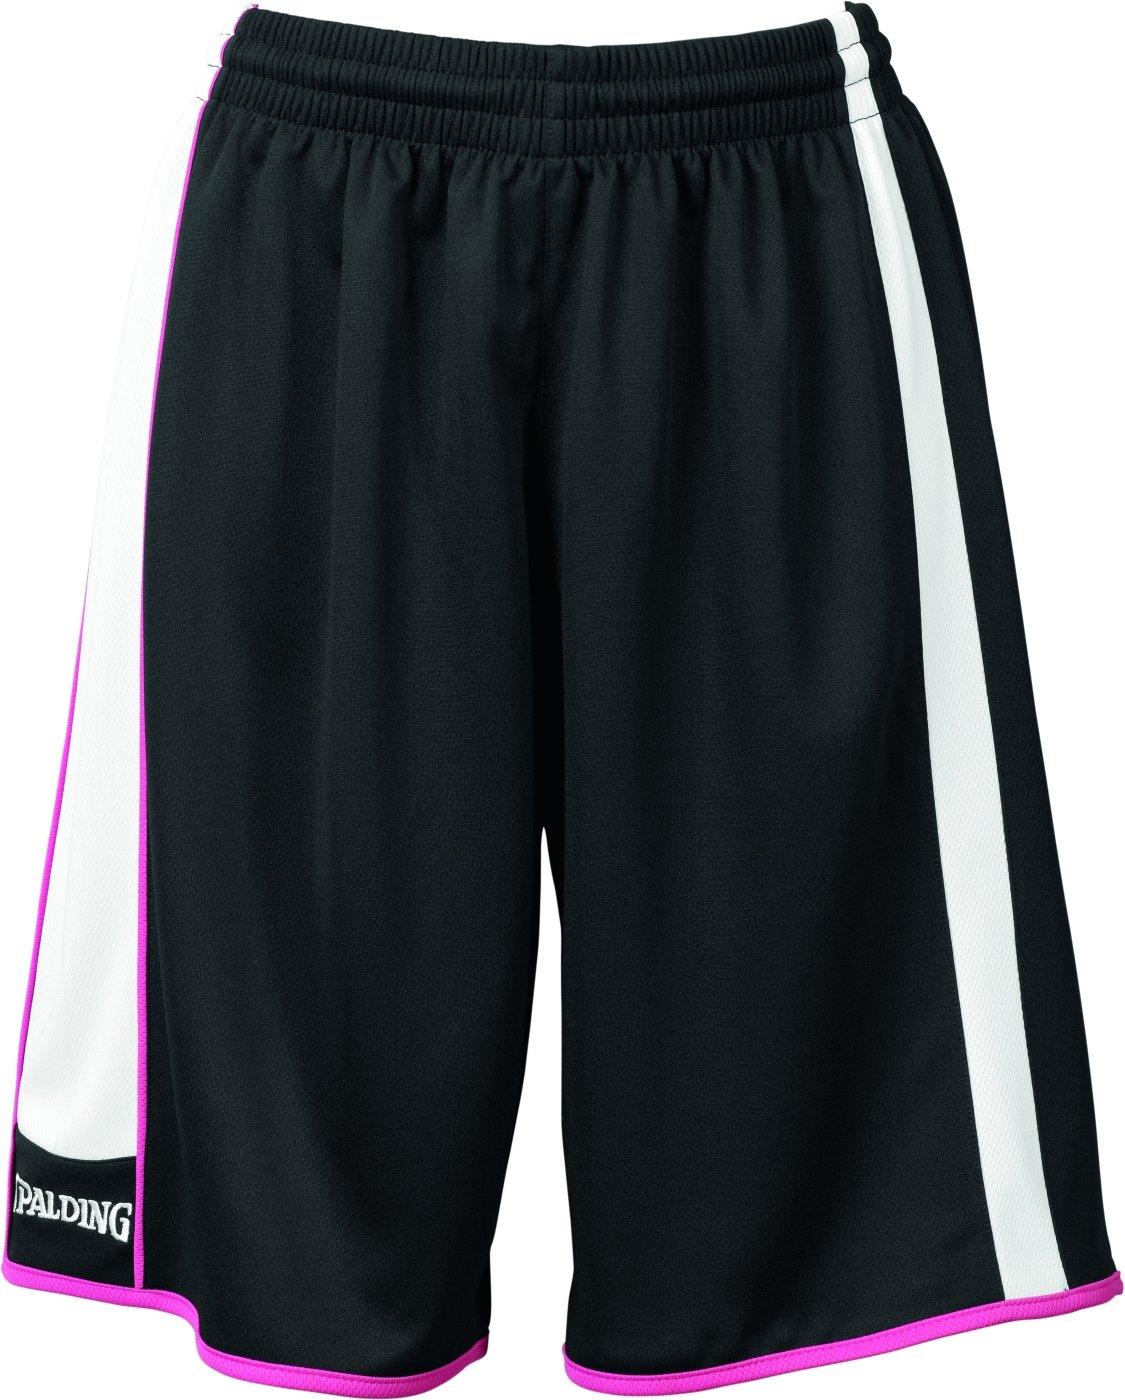 Spalding Damen 4her Shorts